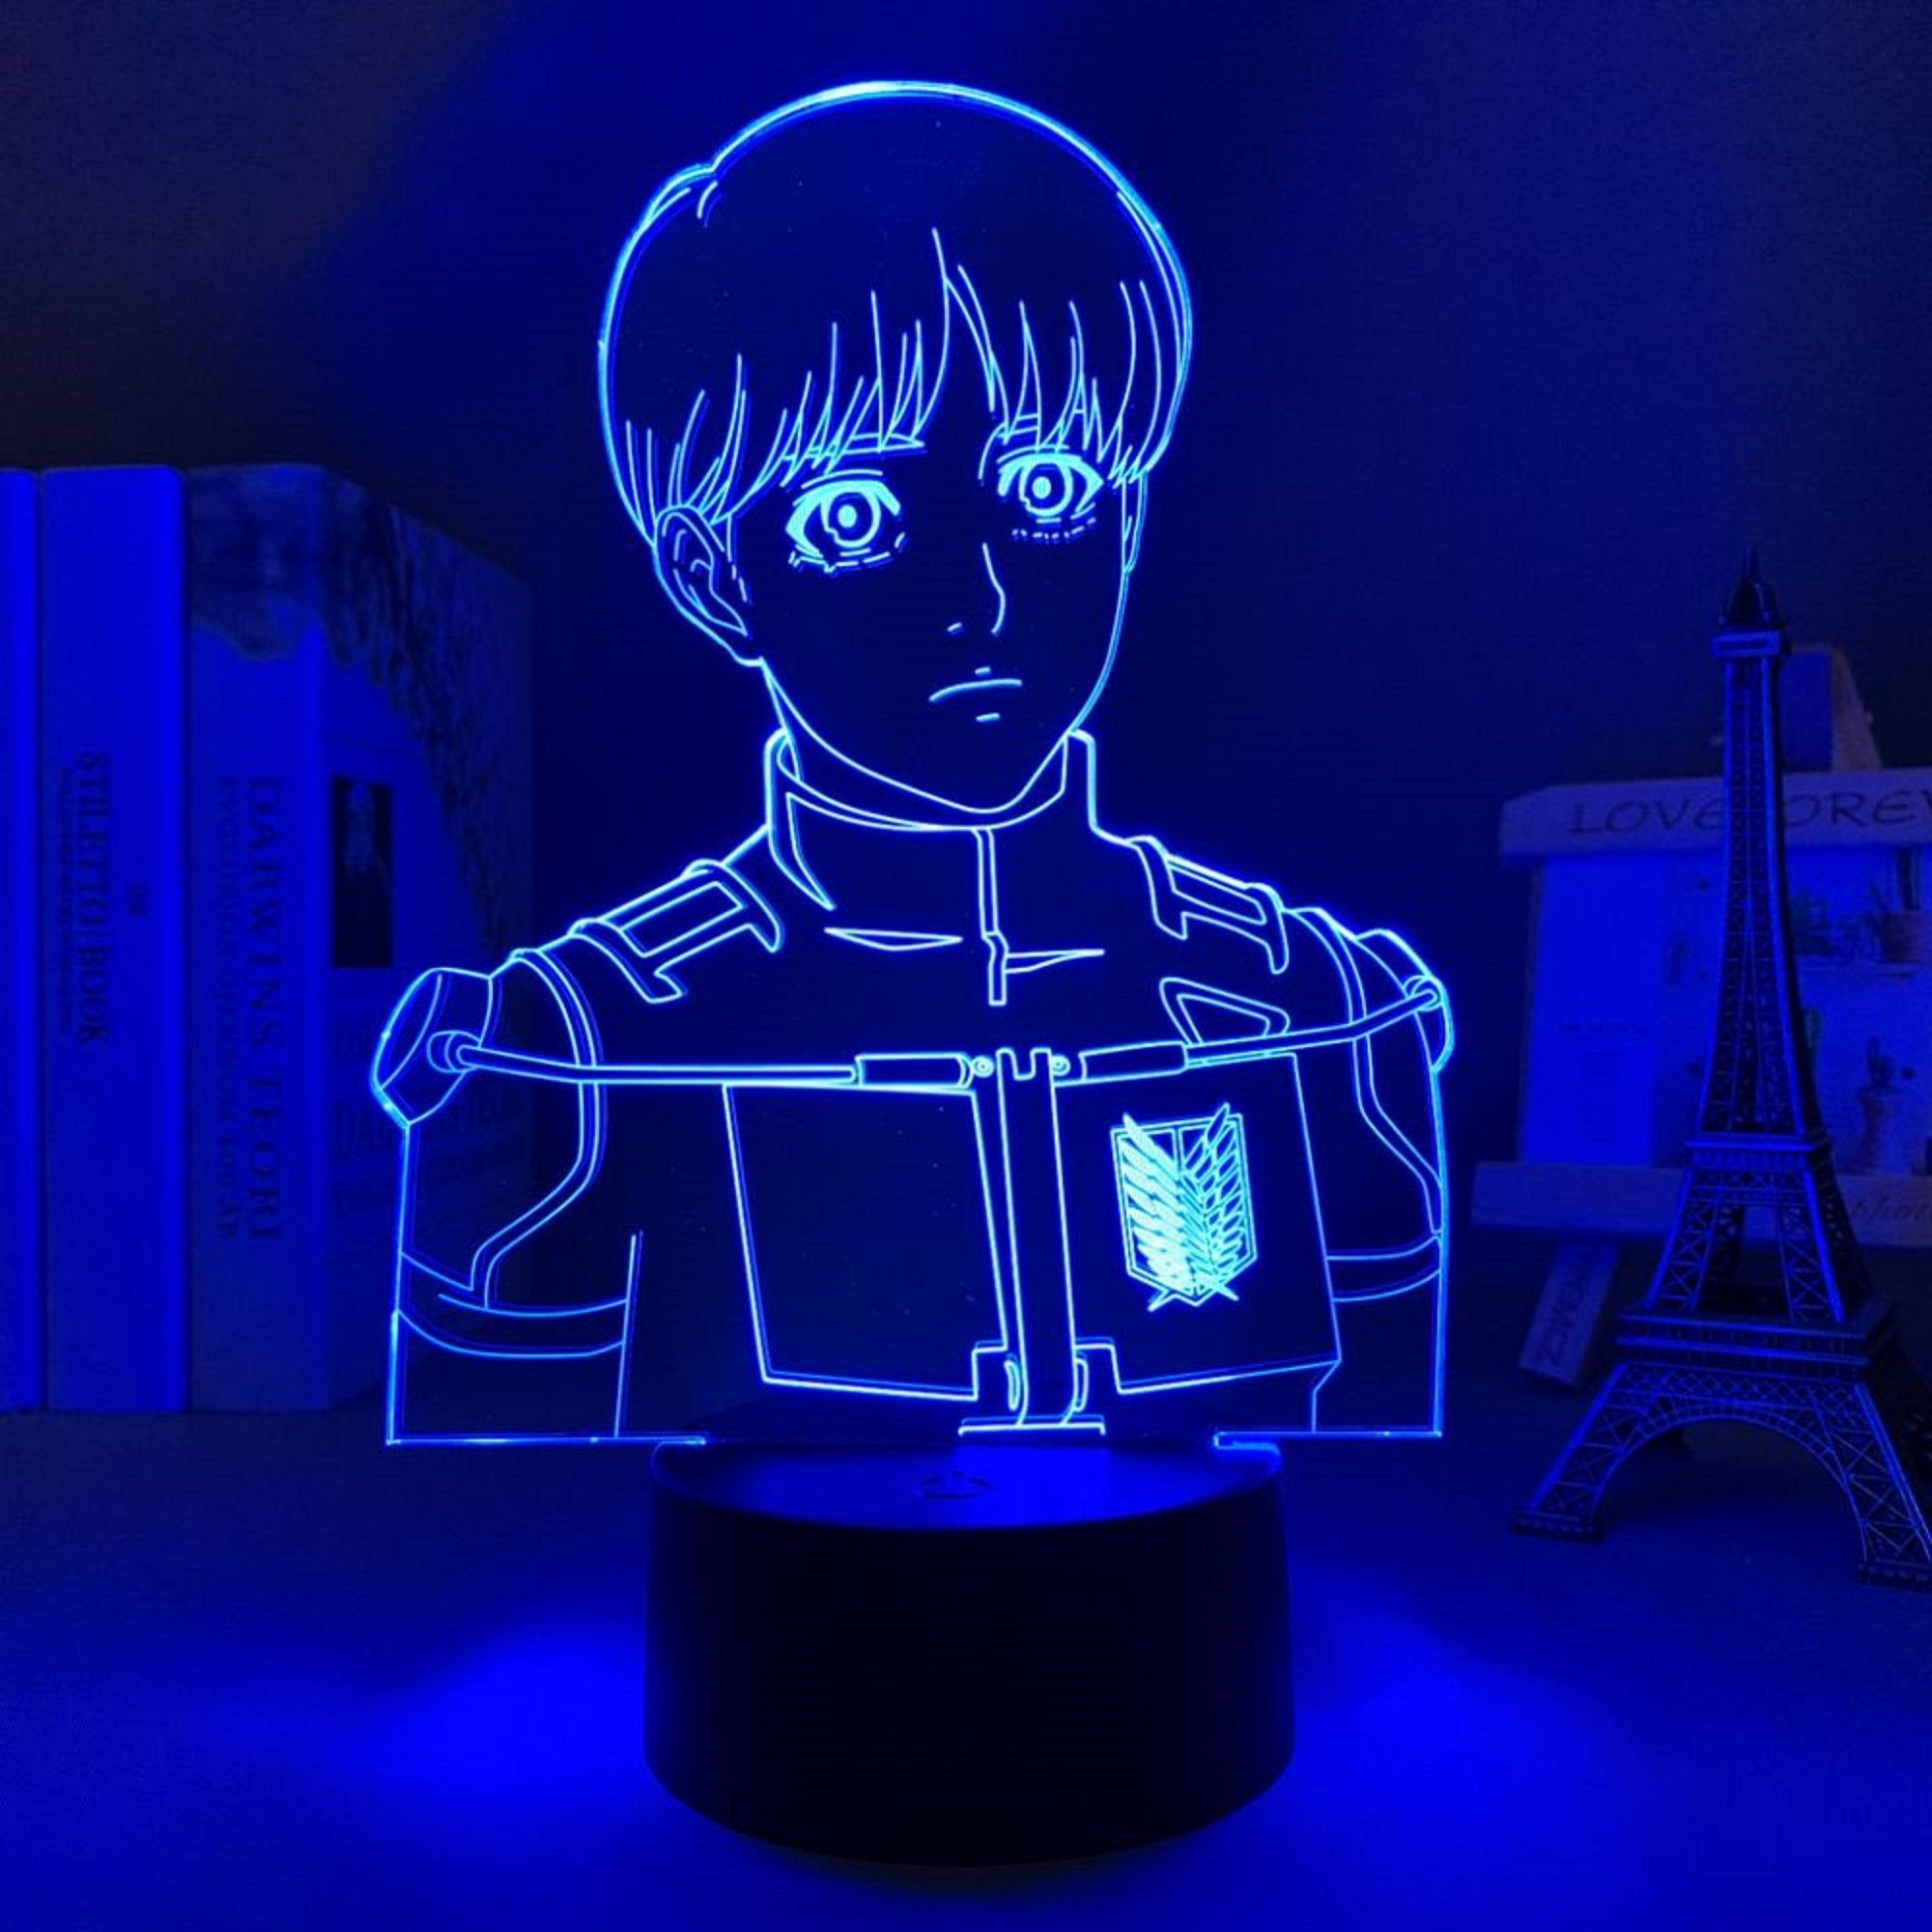 Attack on Titan Armin Arlert 3D Night Light AOT LED Lamp Anime Gifts 3D Illusion Anime LED Light Room Light Home Decor Colourful Light